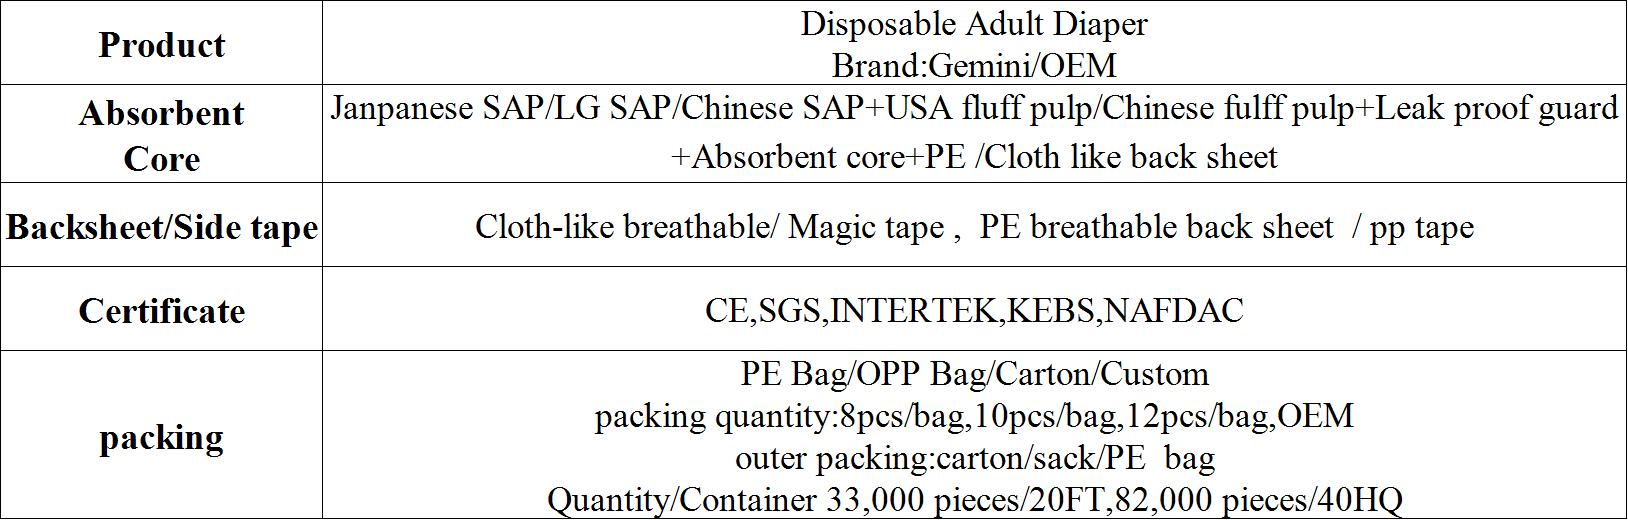 चीन से सस्ते वयस्क डायपर देखभाल दैनिक थोक सबसे अधिक लागत-प्रभावी सस्ते वयस्क डायपर